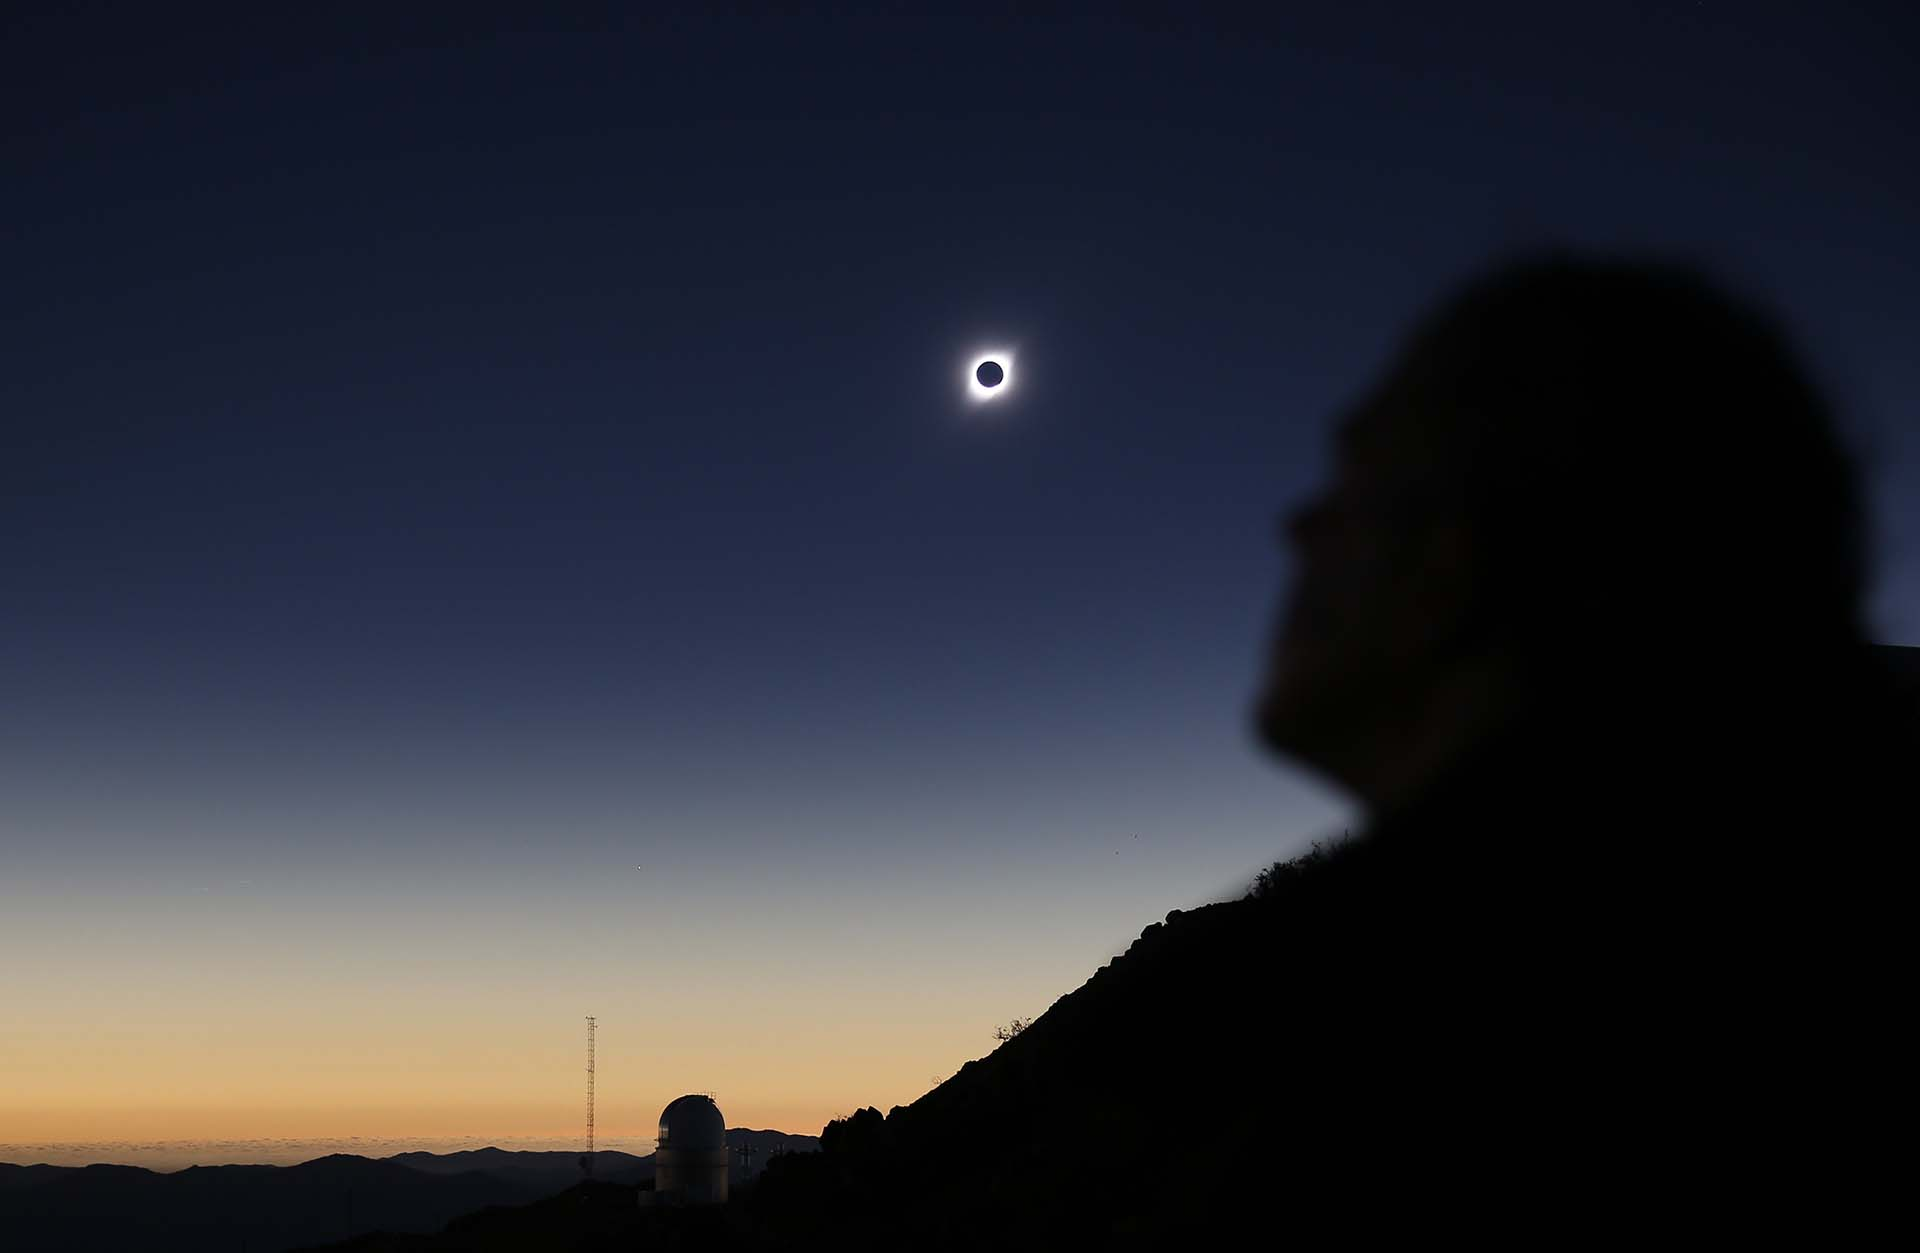 Una persona observa el eclipse solar en Coquimbo, Chile(REUTERS/Rodrigo Garrido)